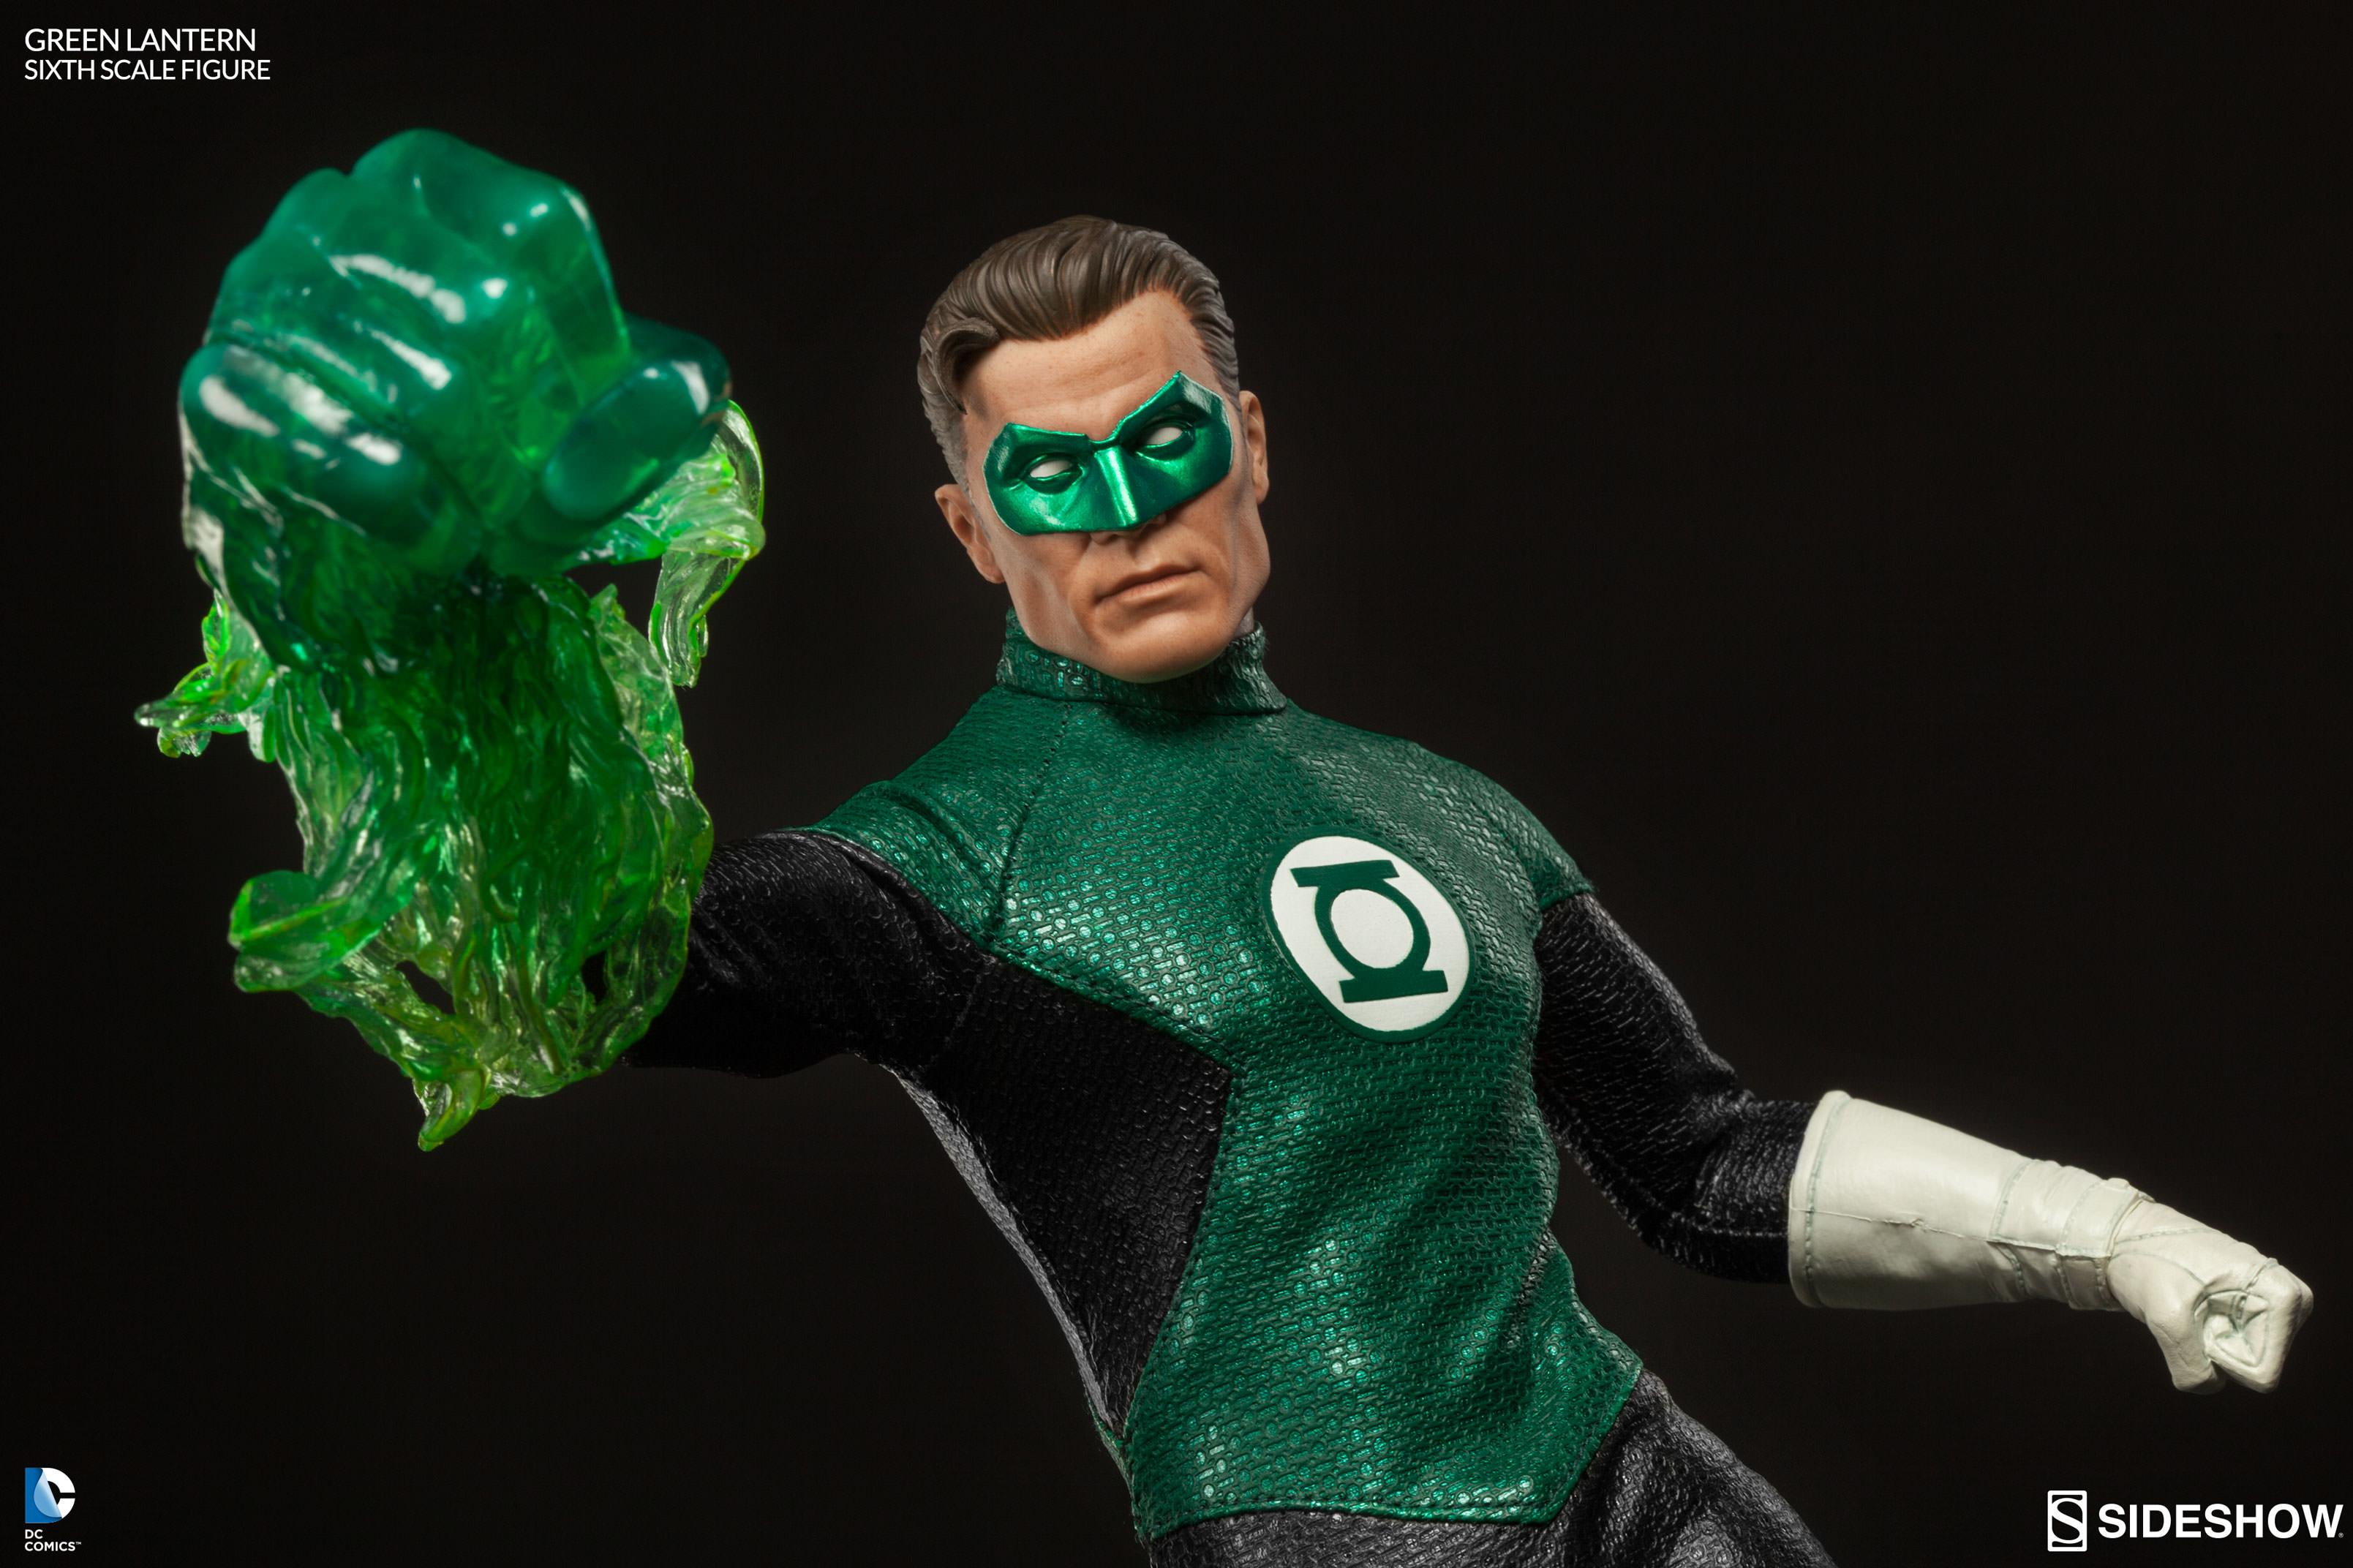 Dc Comics Green Lantern Sixth Scale Figure By Sideshow